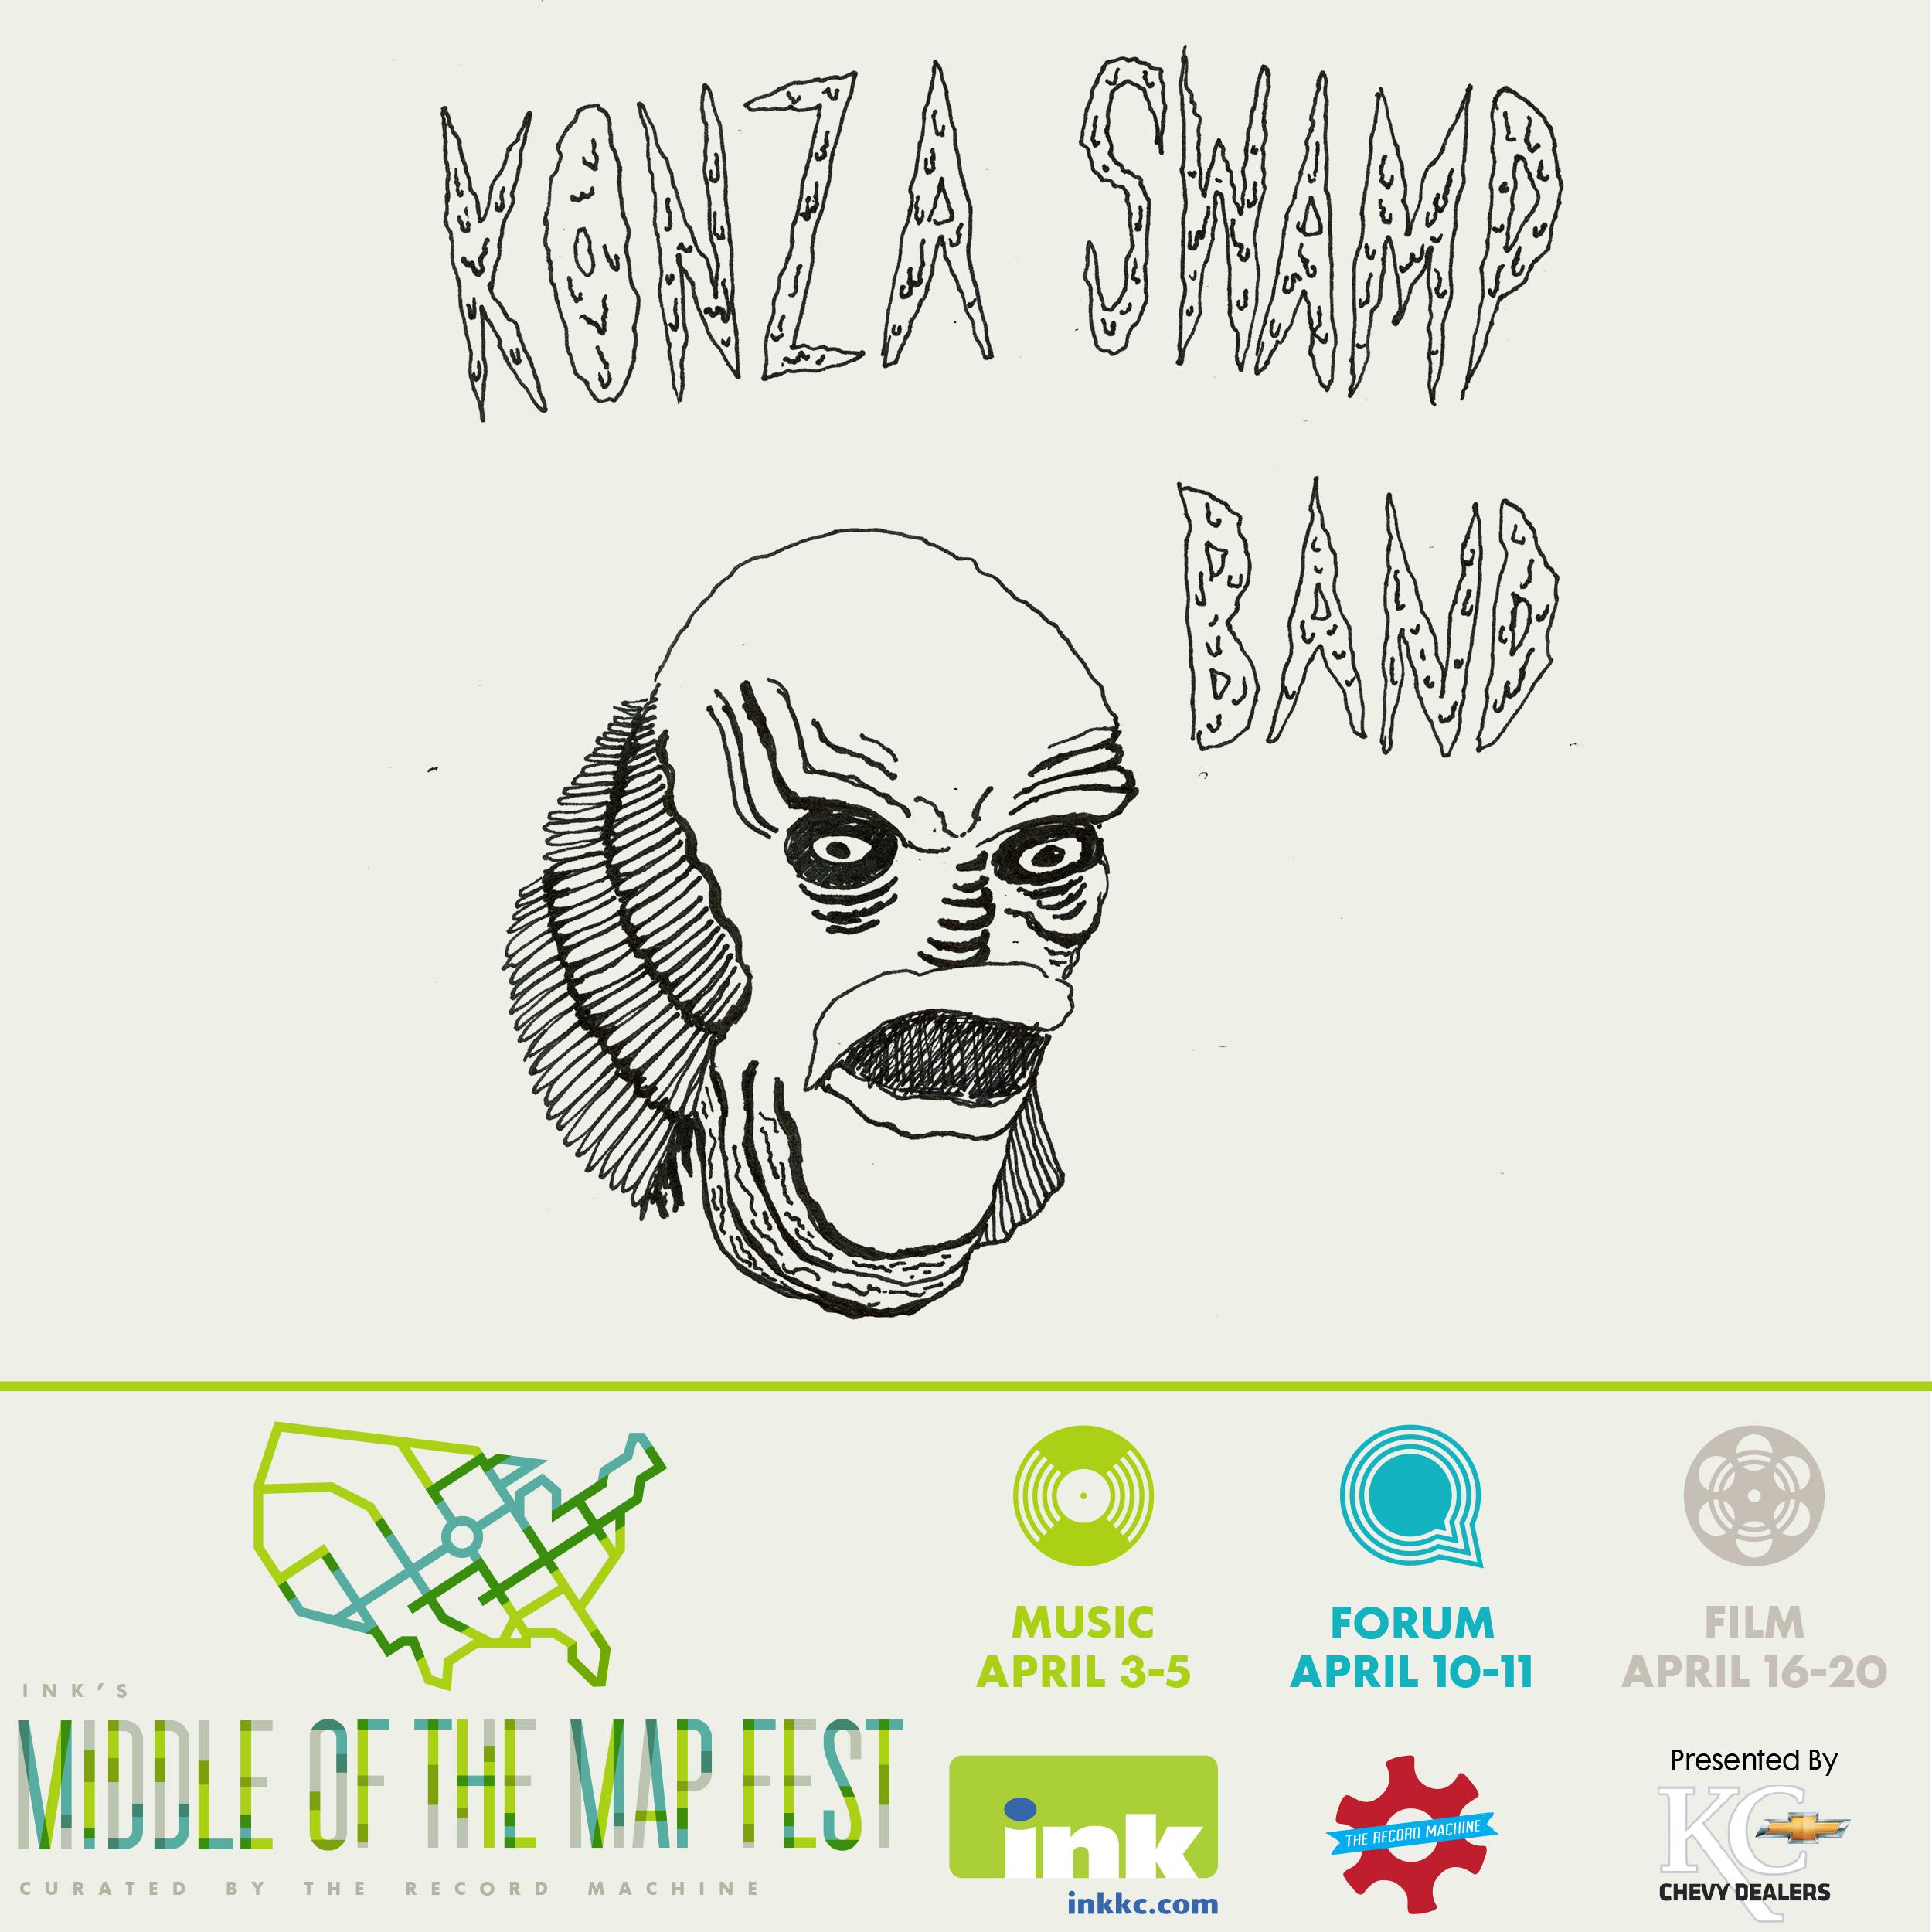 konza_swamp_band.jpg